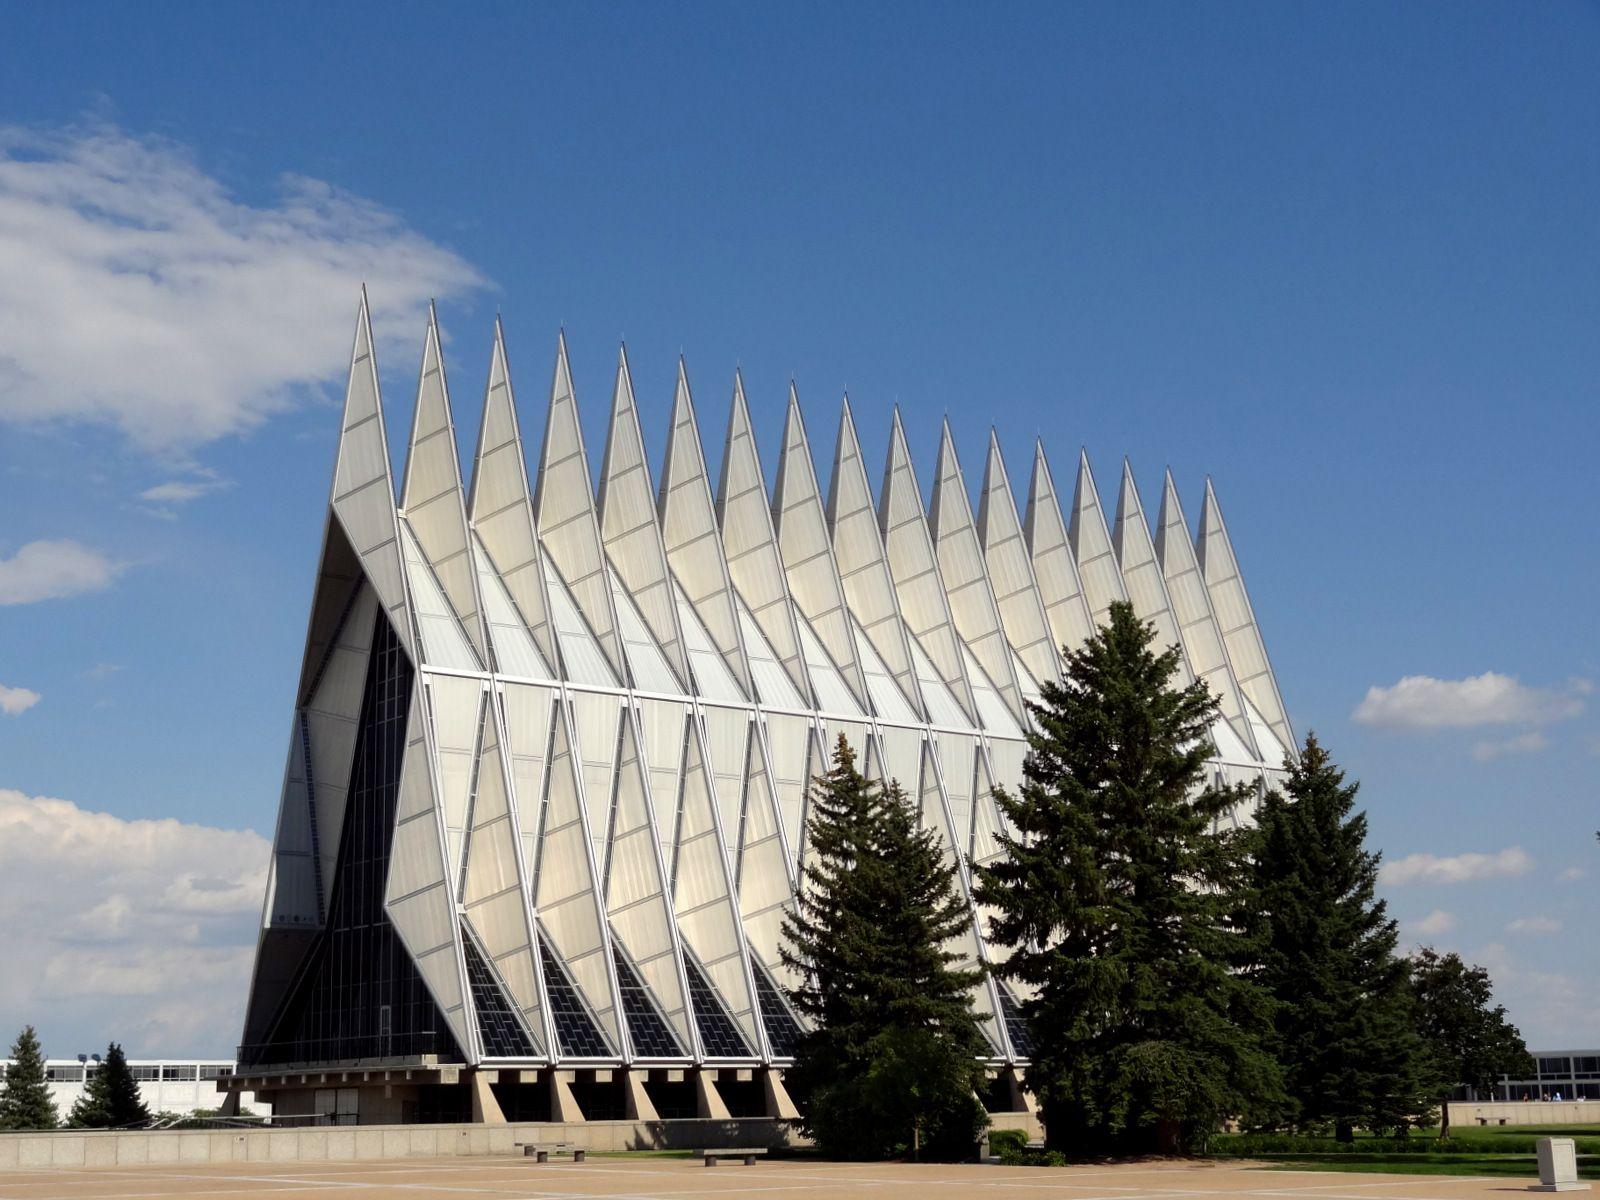 Air Force Academy Chapel Air force academy, Opera house